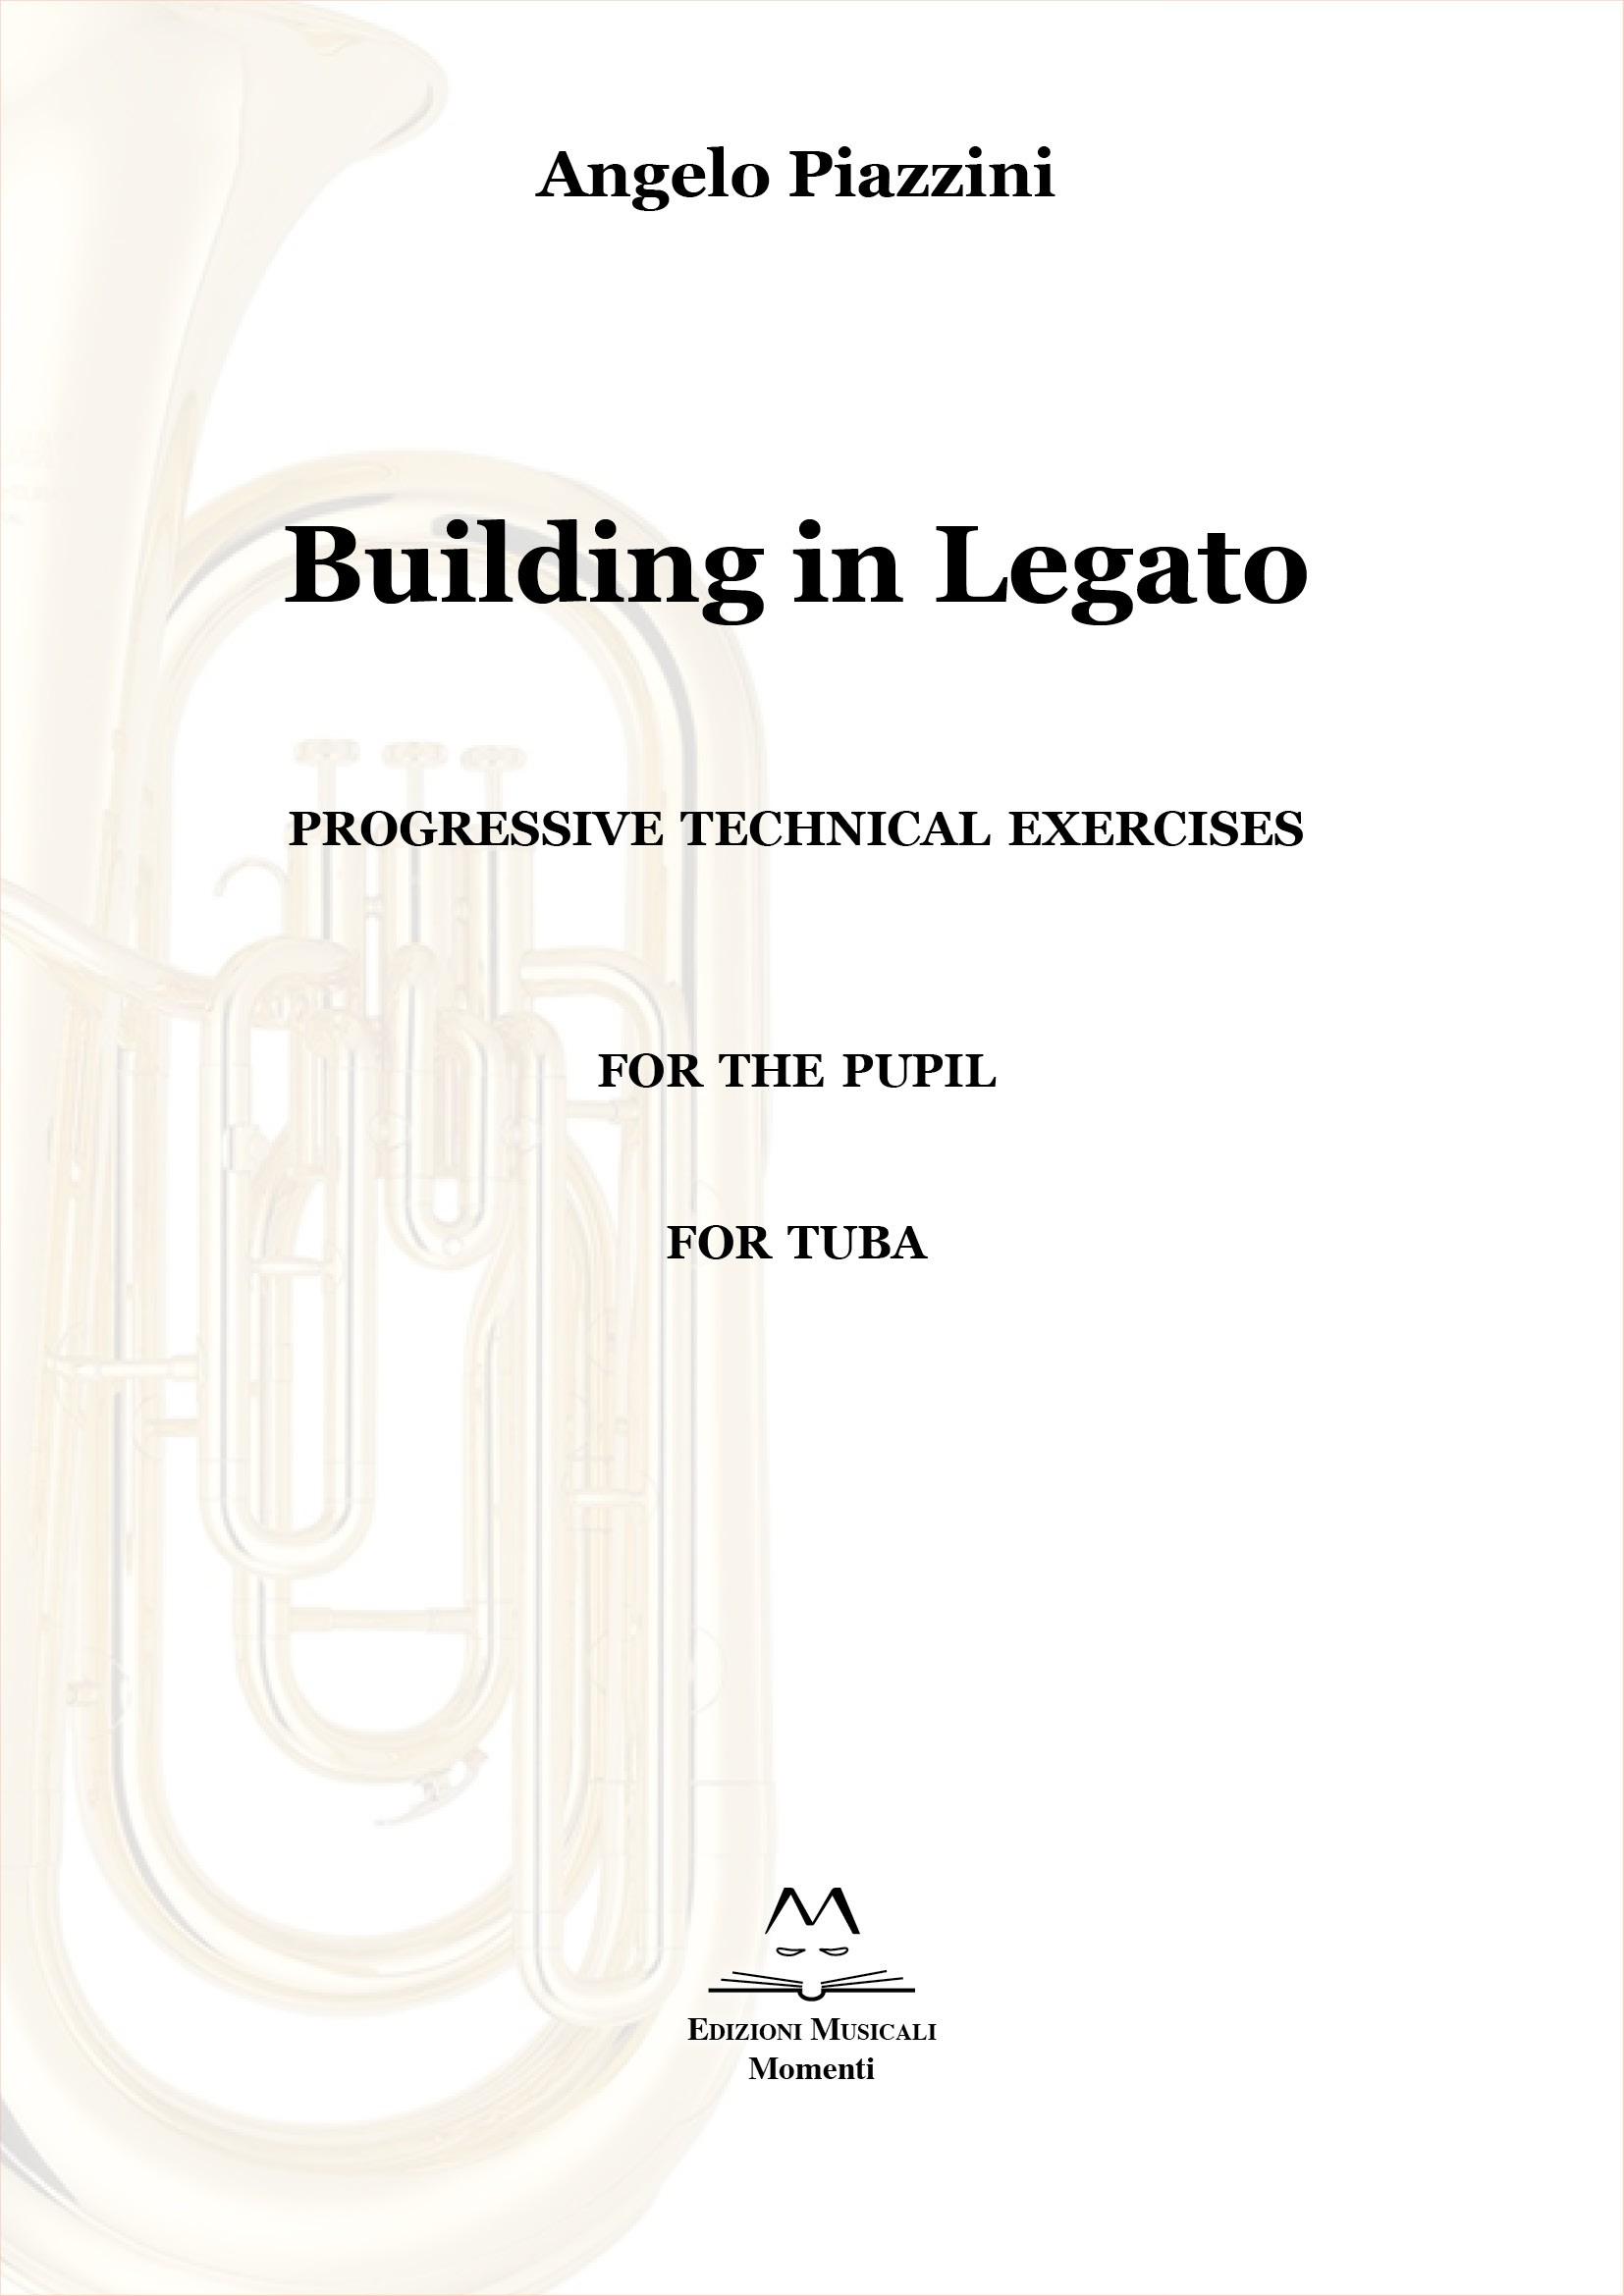 Building in Legato for the pupil di Angelo Piazzini